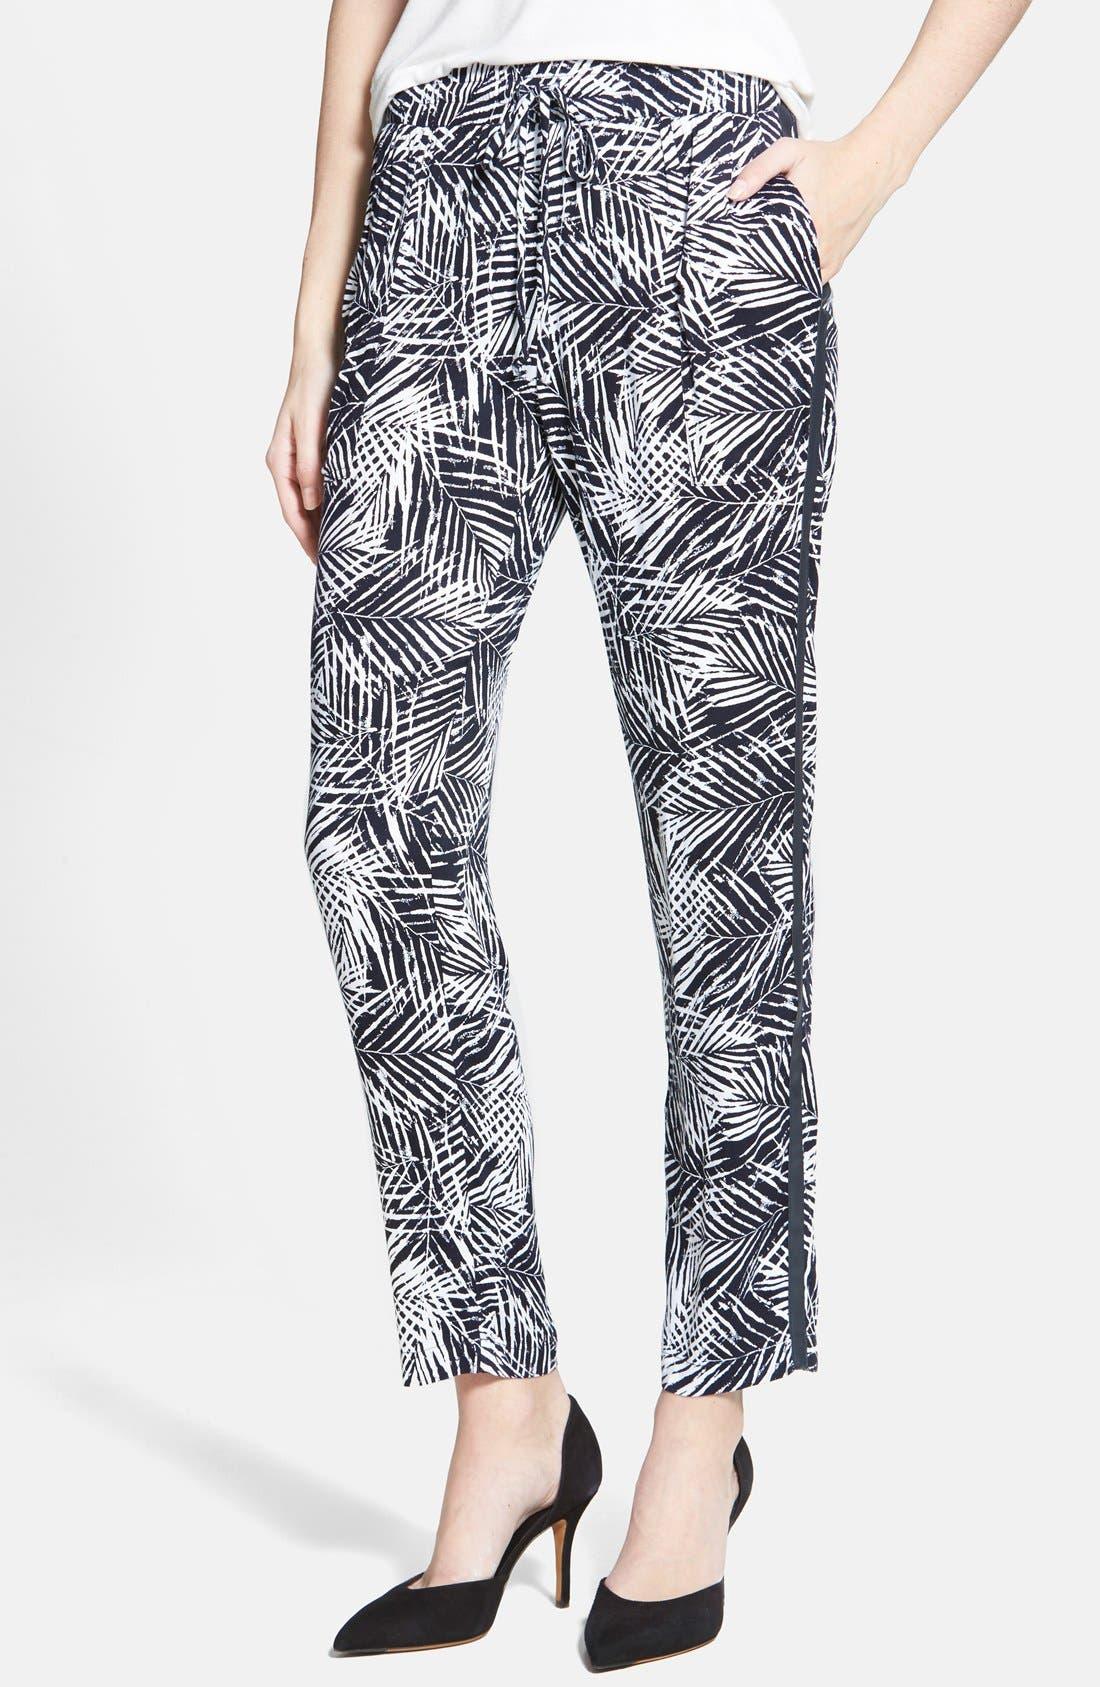 Alternate Image 1 Selected - Bailey 44 'Palm Tree' Drawstring Pants